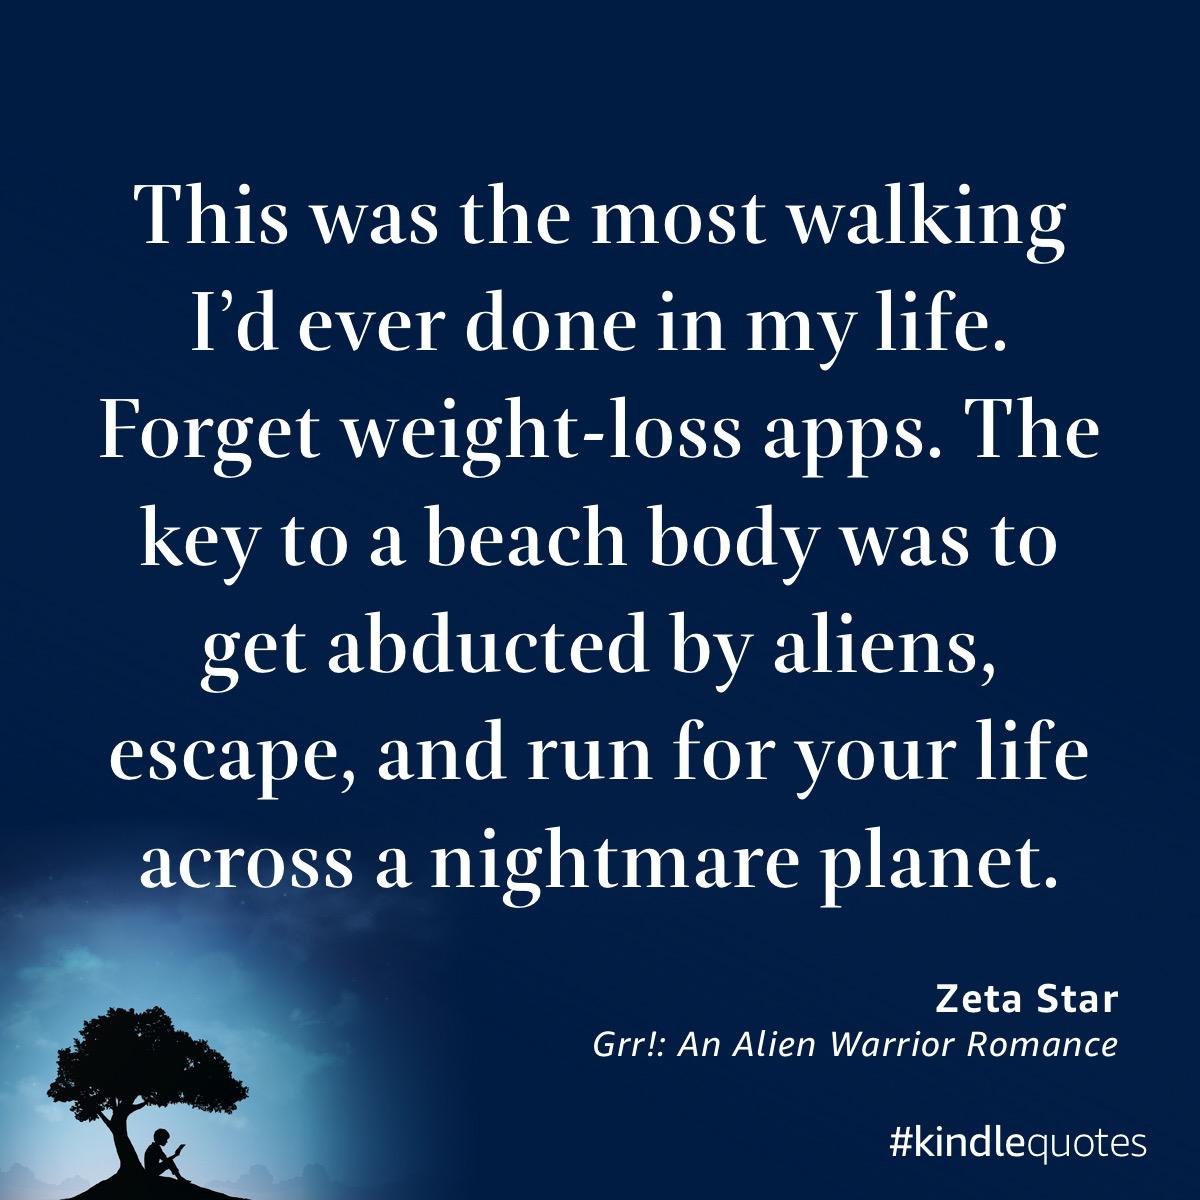 Book quote Zeta Star